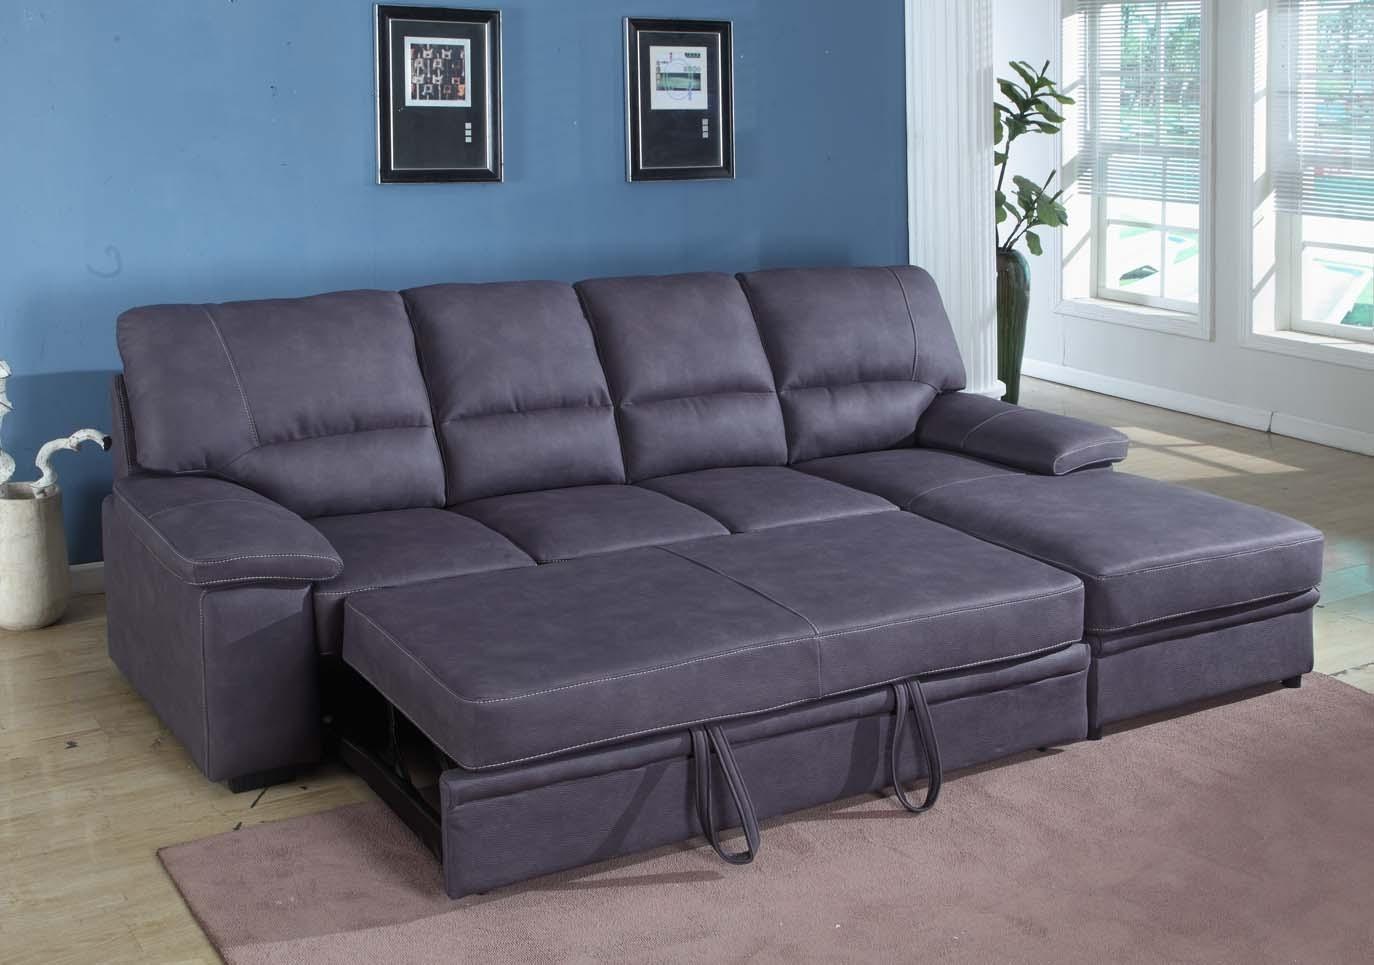 Grey Sleeper Sectional Sofa   Houston Mattress King Inside Houston Sectional Sofas (View 4 of 10)